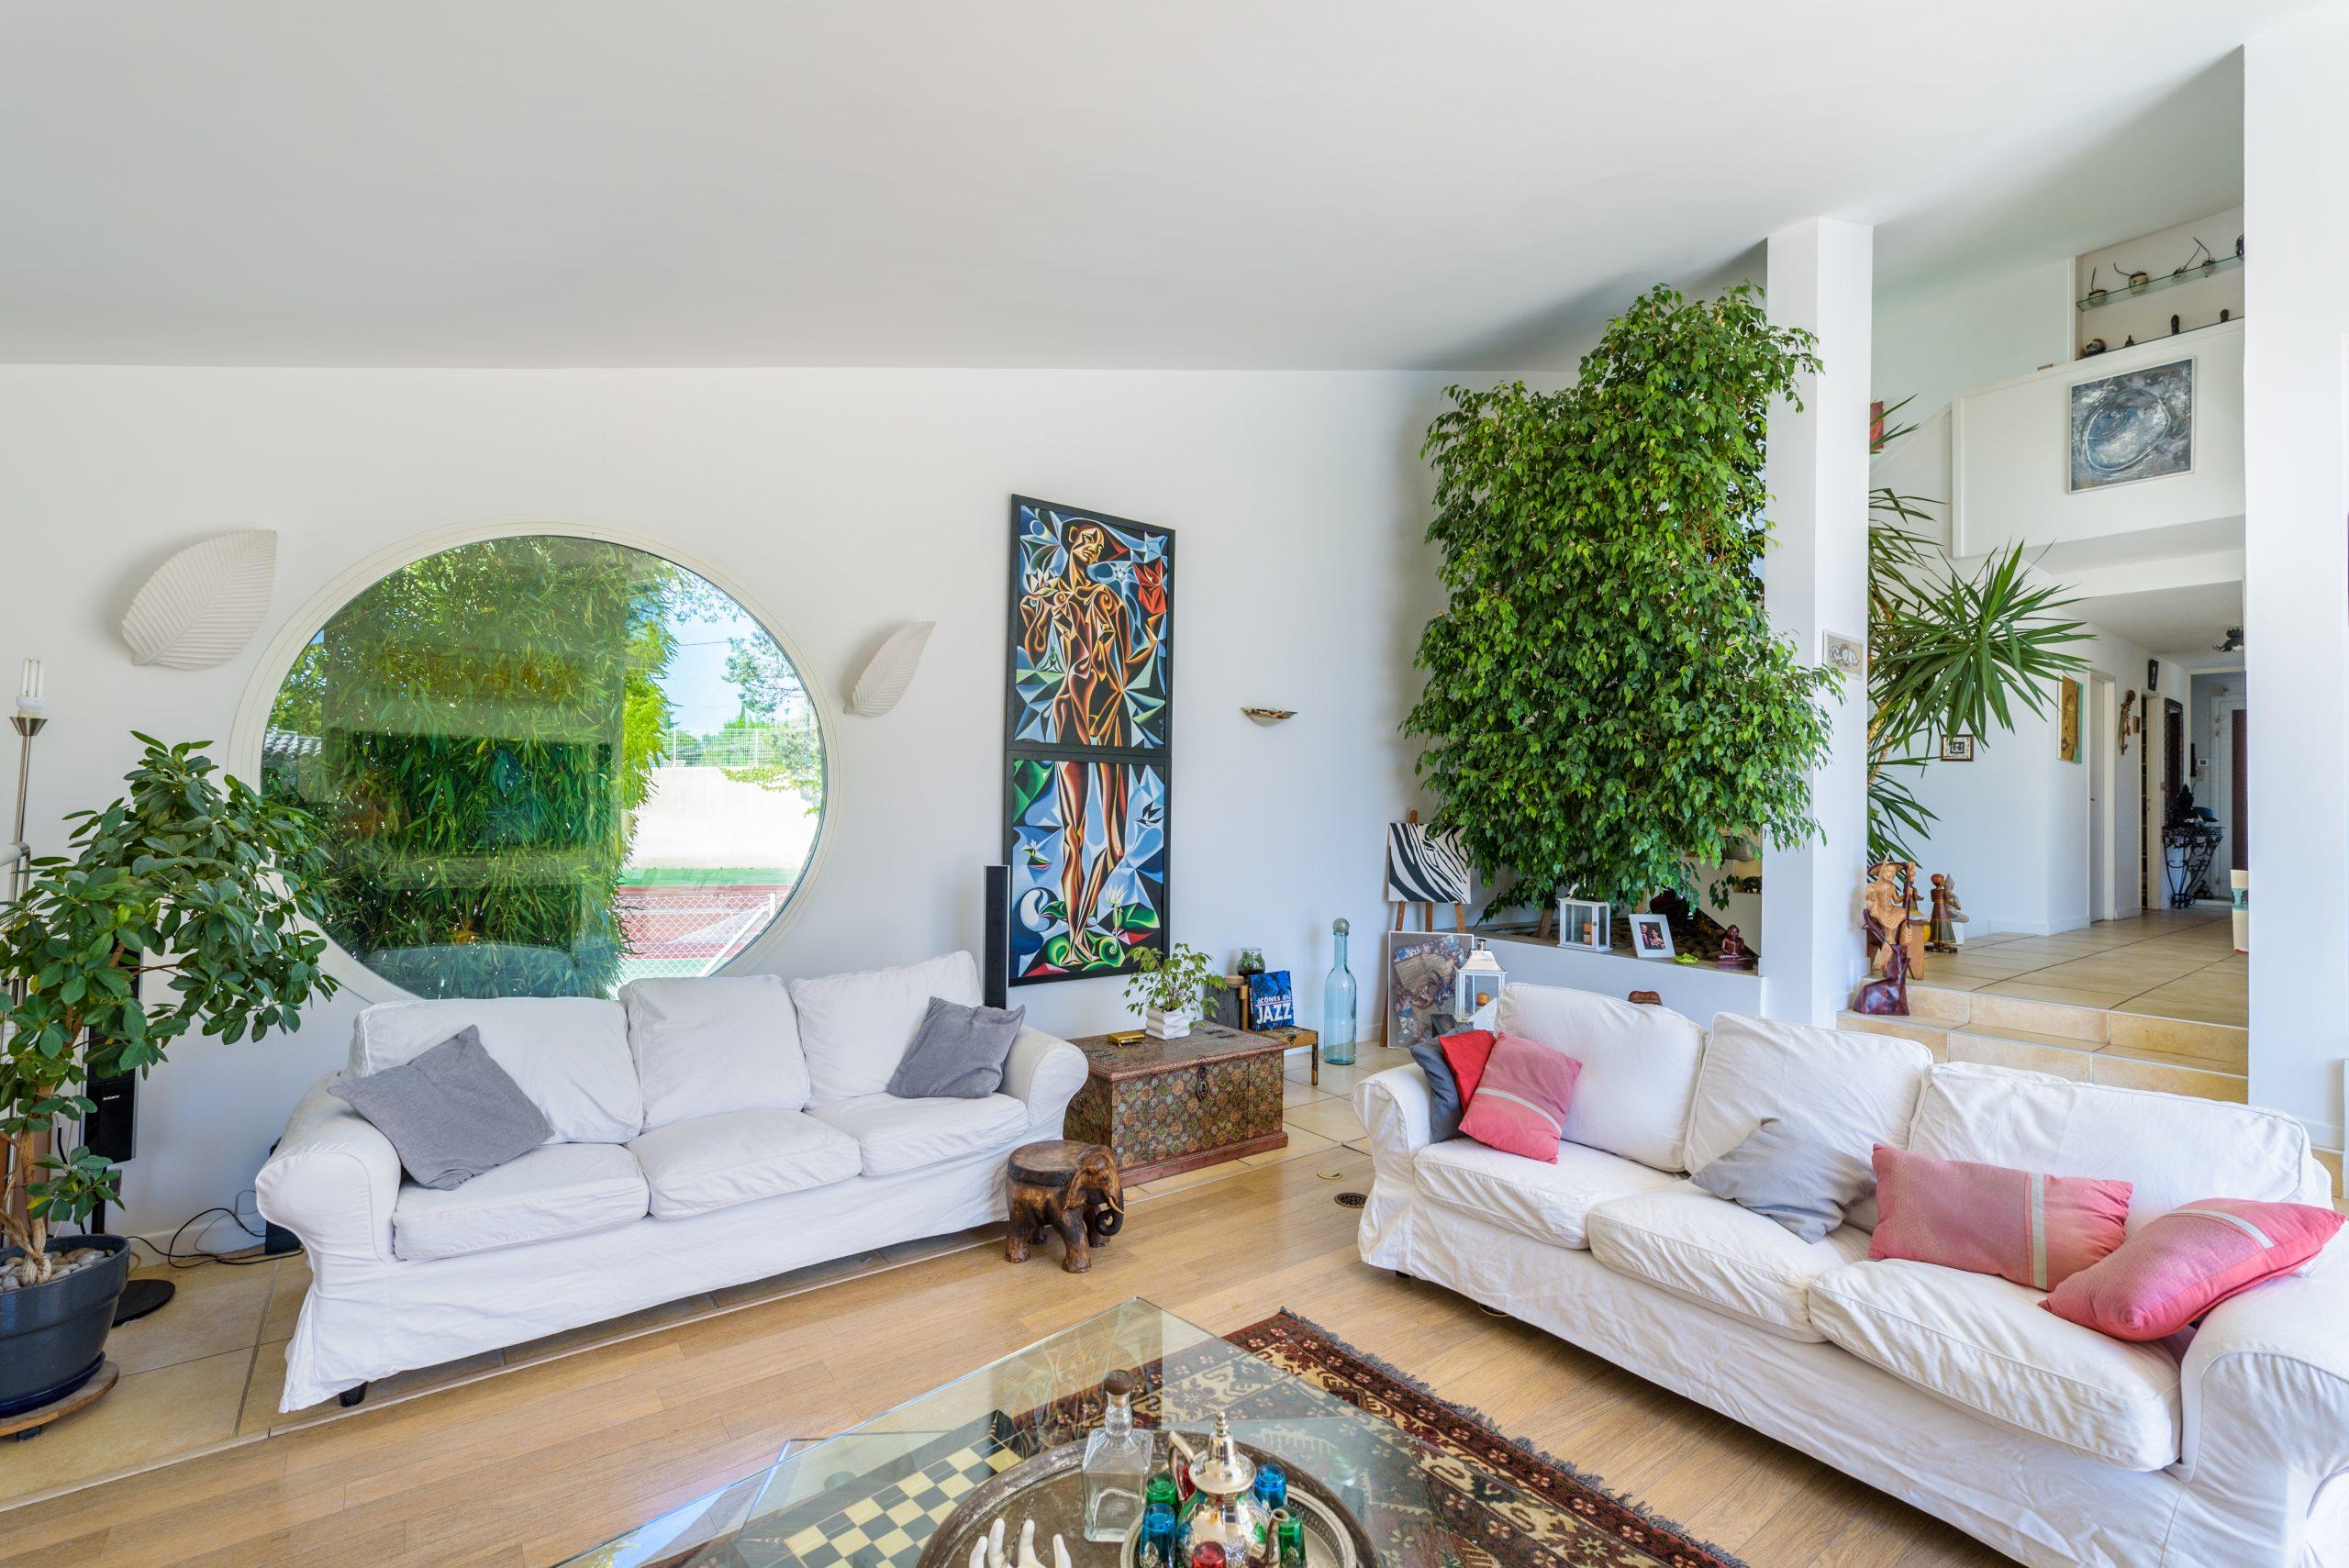 photo-couleur-grand salon-maison-de-luxe-dans-lherault-photographe-immobilier-christelle-labrande-gard-herault